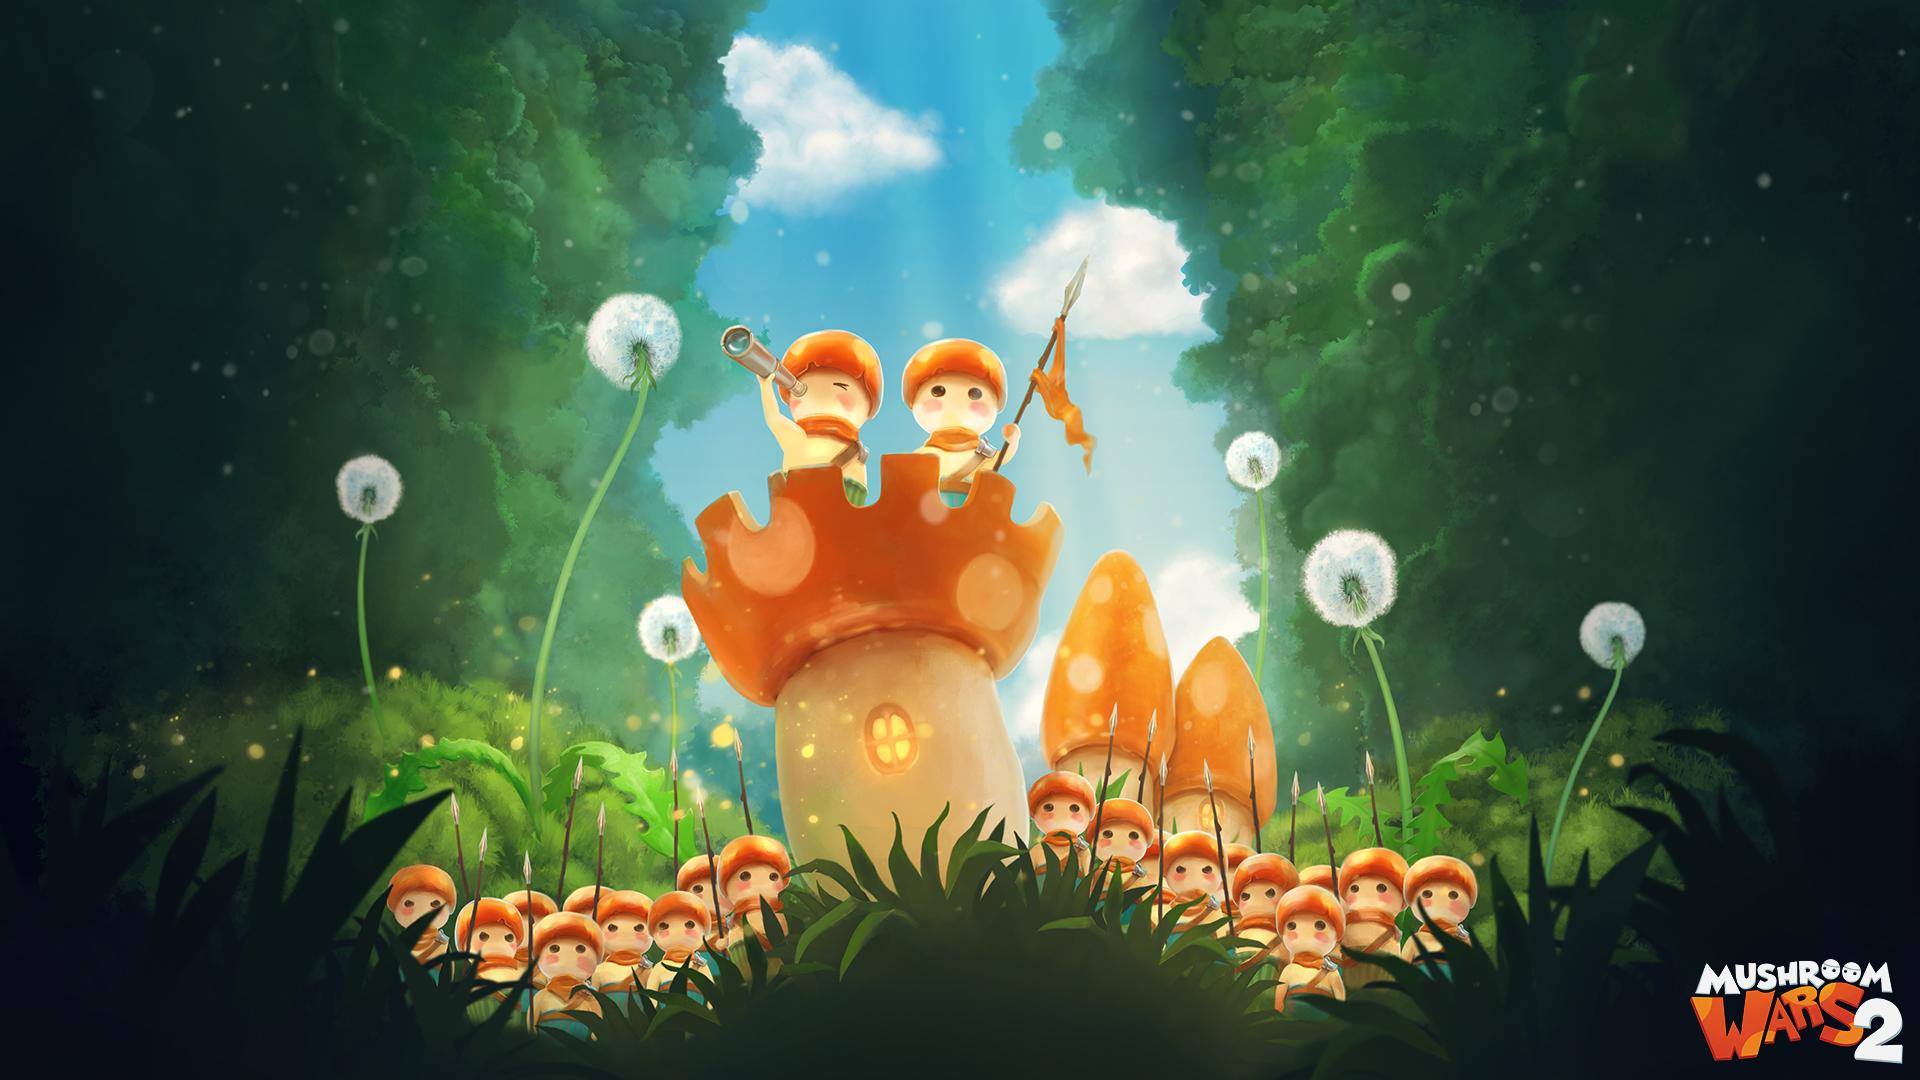 mushrooms wars 2